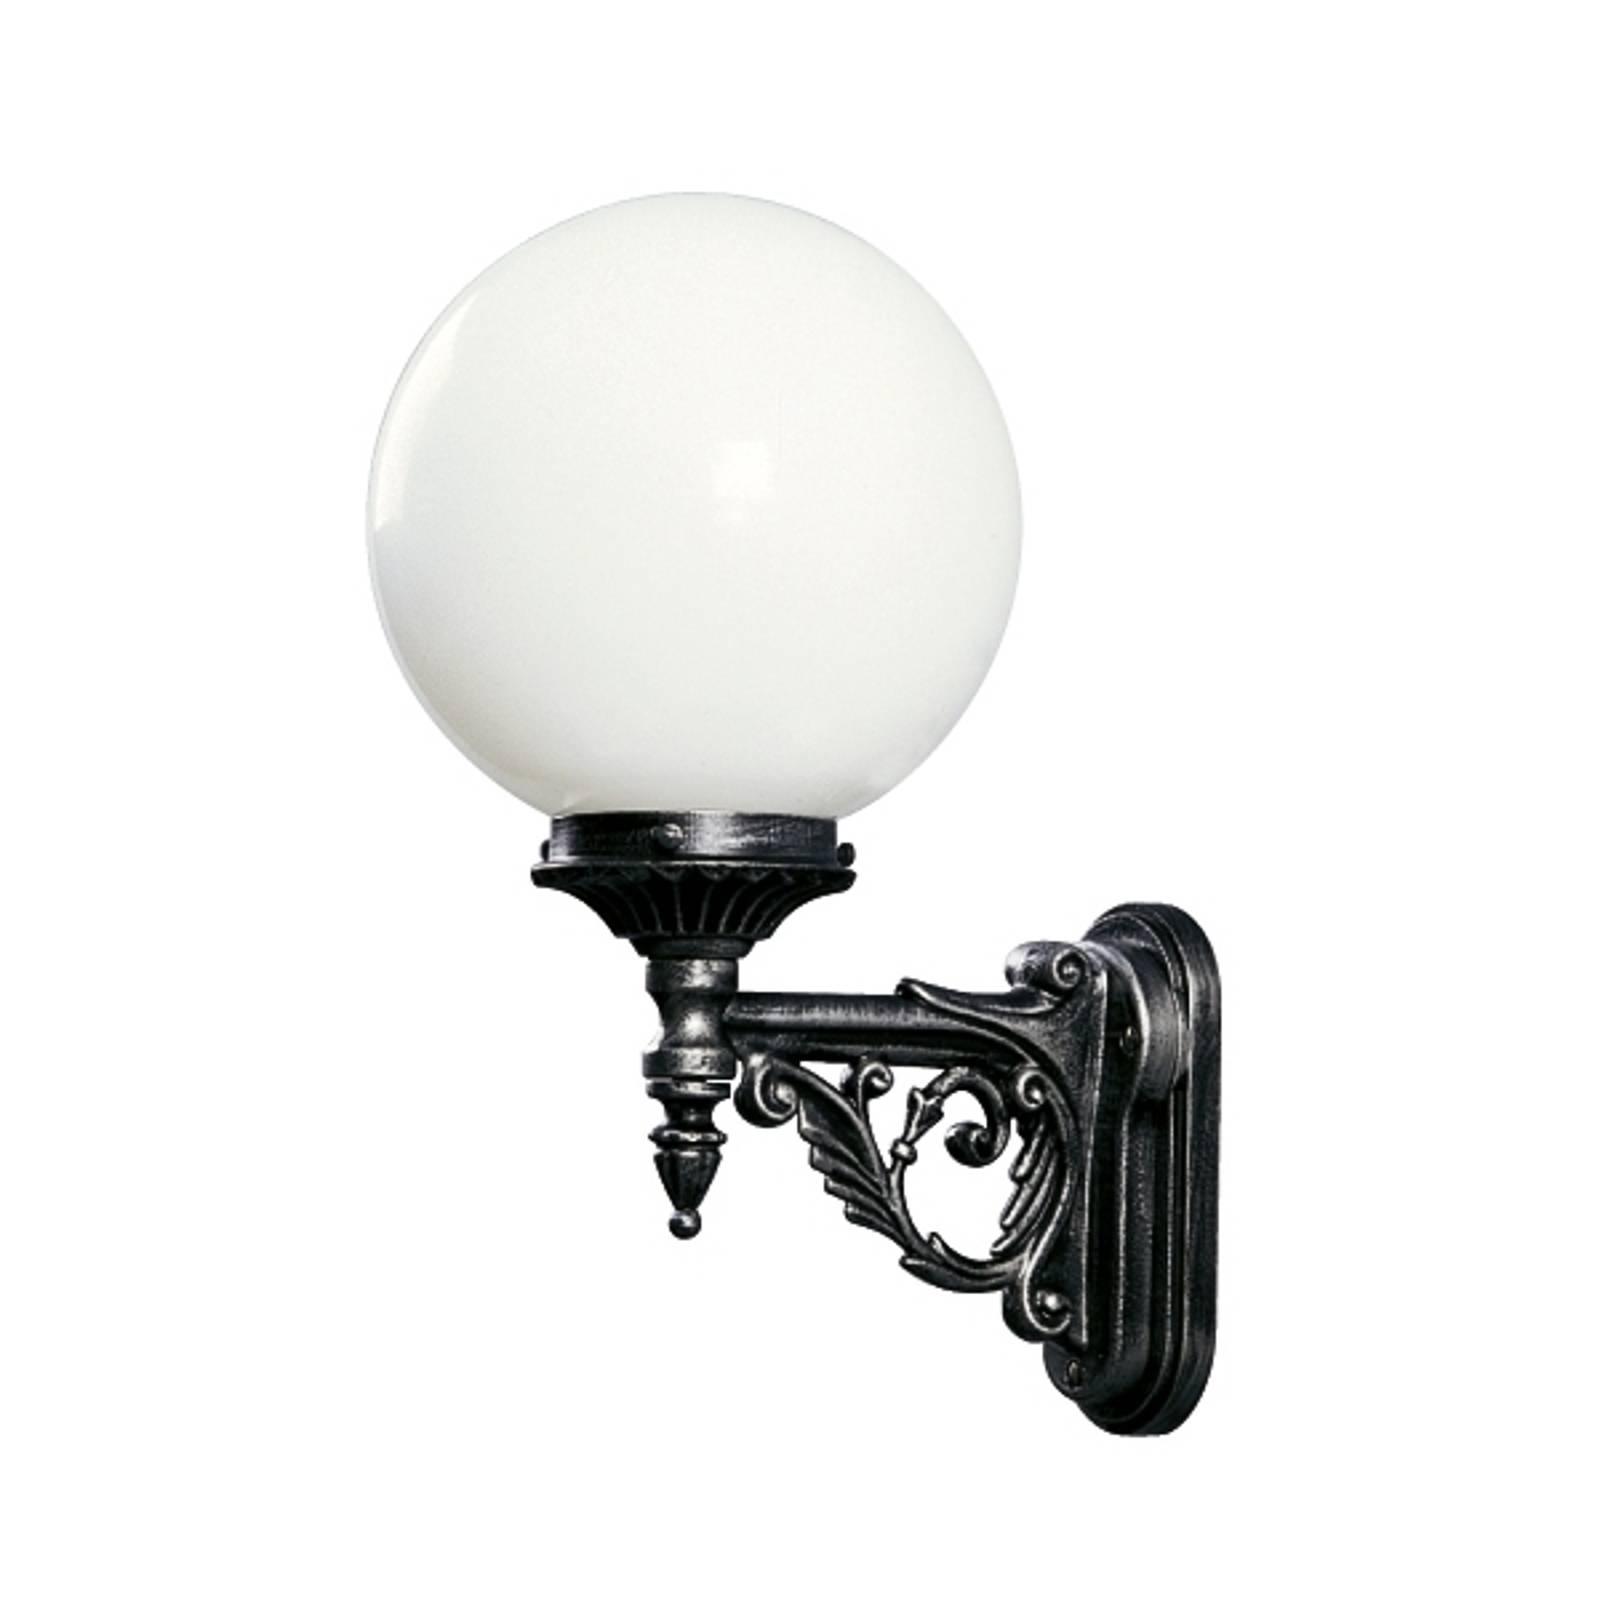 Decoratieve buitenwandlamp SIL 159